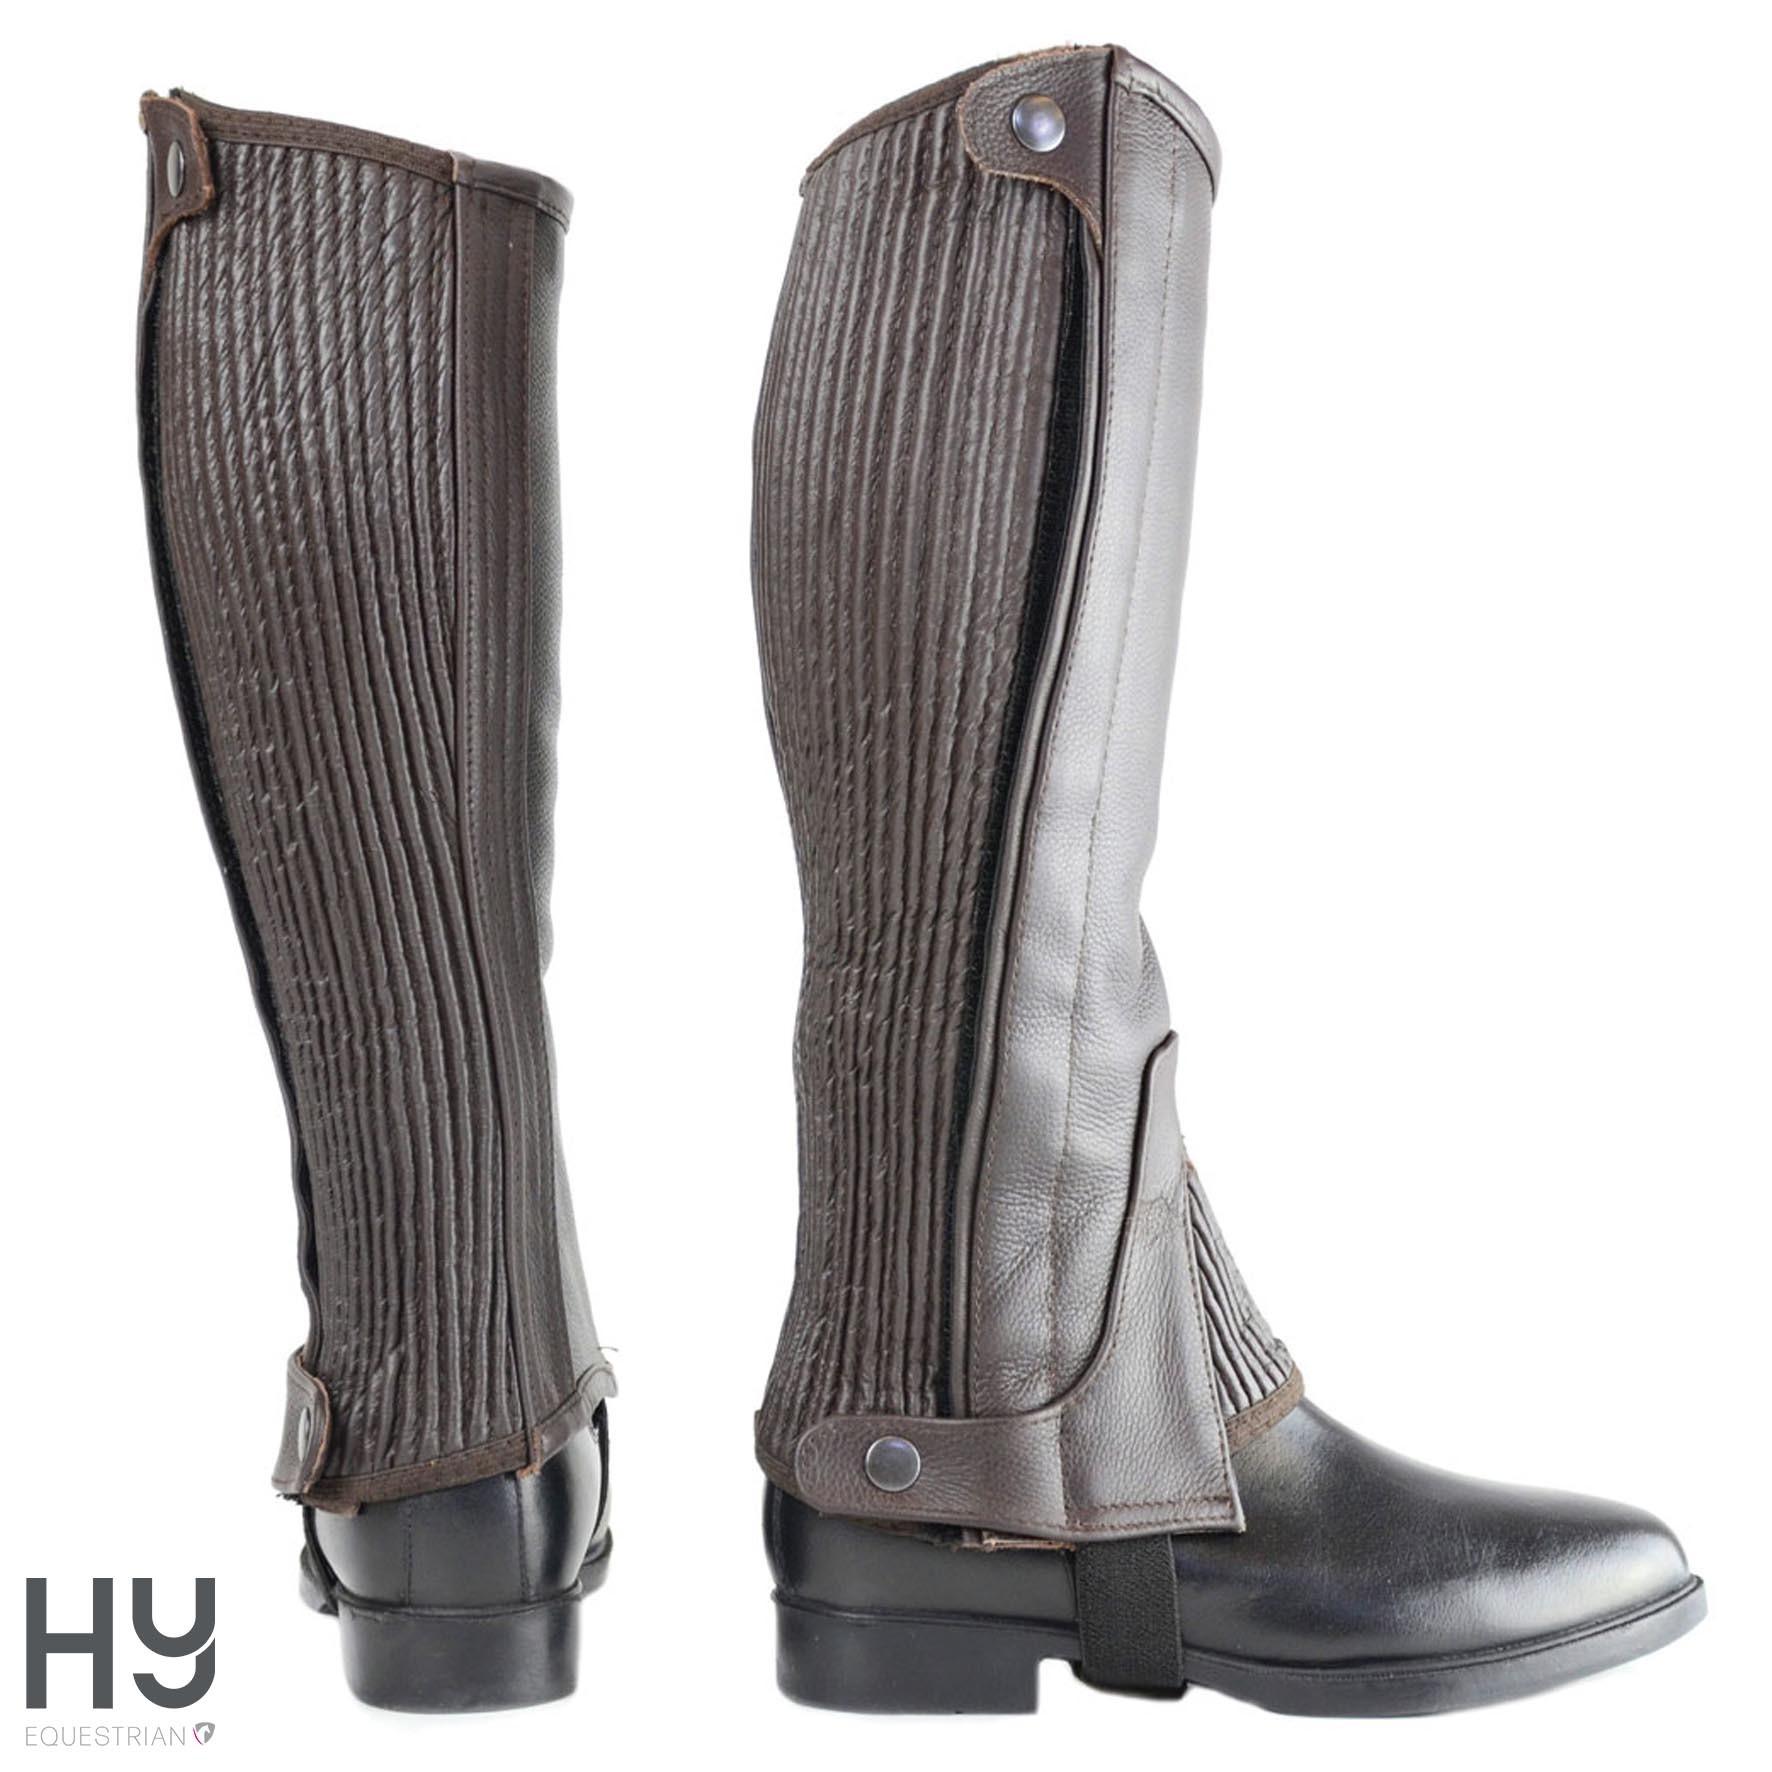 HyLAND Leather Half Chaps